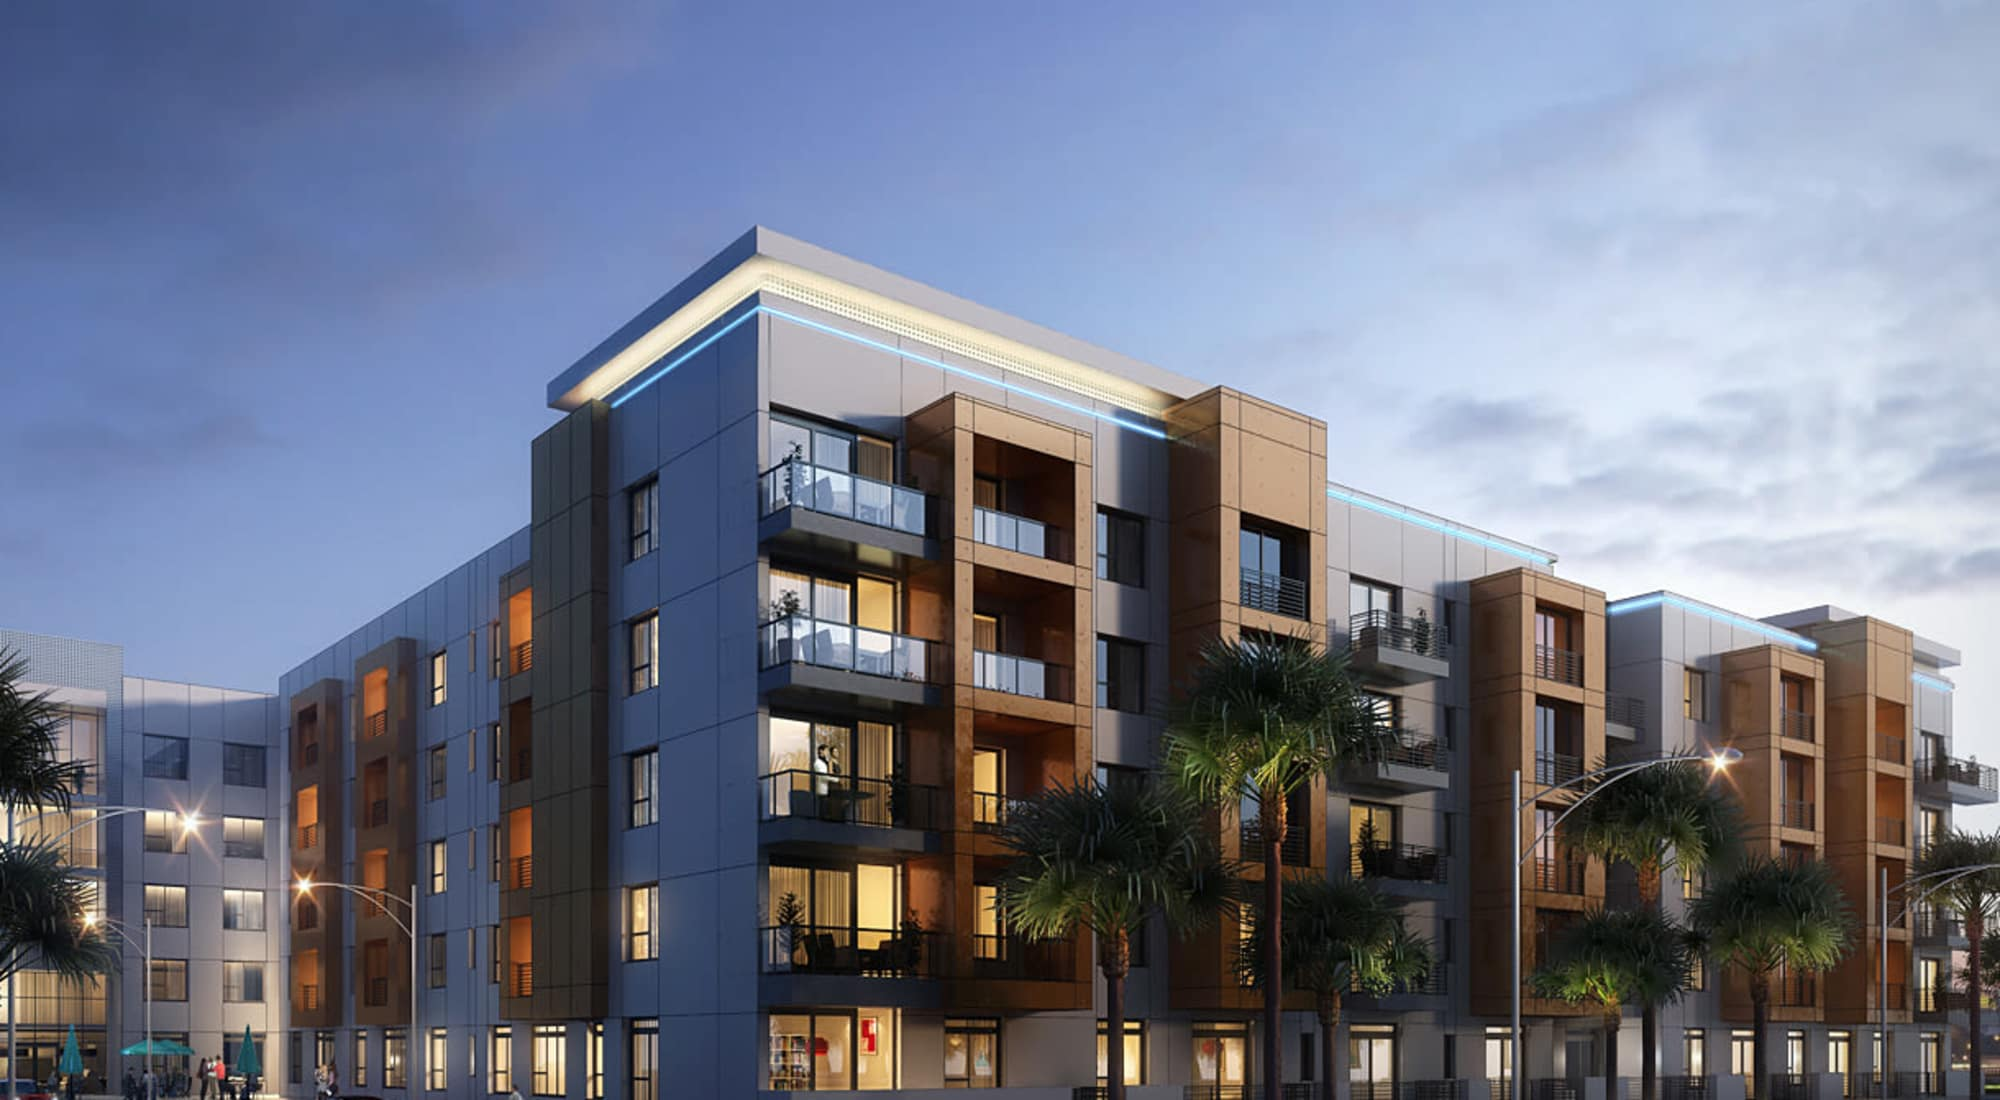 LeCesse Development Corporation in Altamonte Springs, Florida